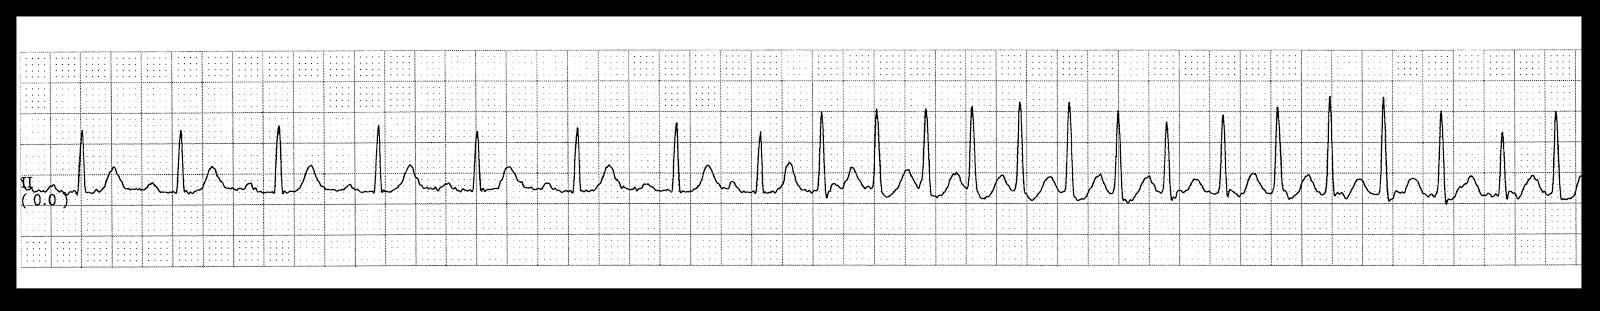 how to stop supraventricular tachycardia